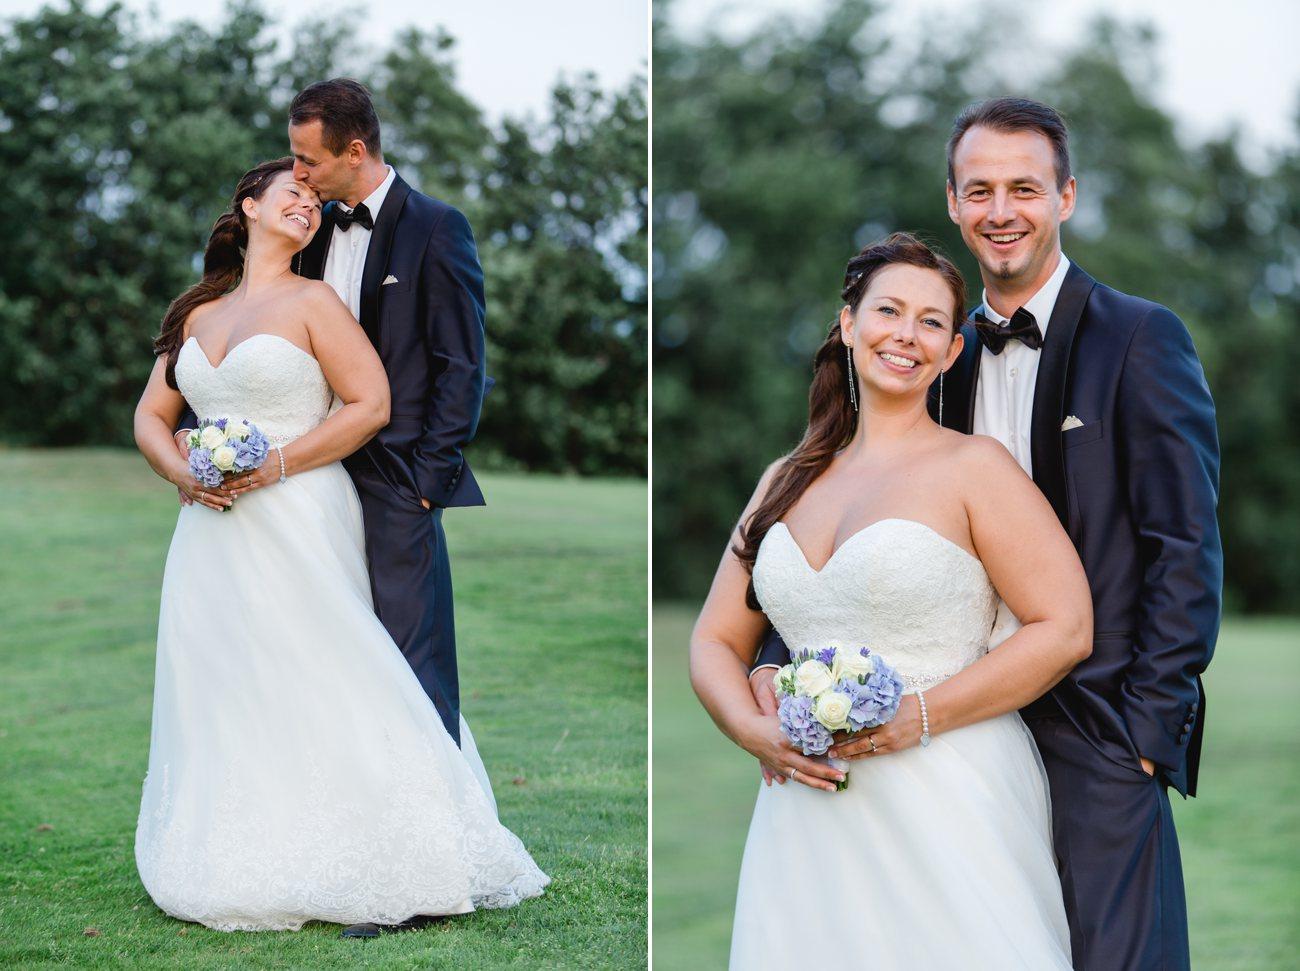 Hochzeitsfotograf_A-Rosa_Scharmuetzelsee091